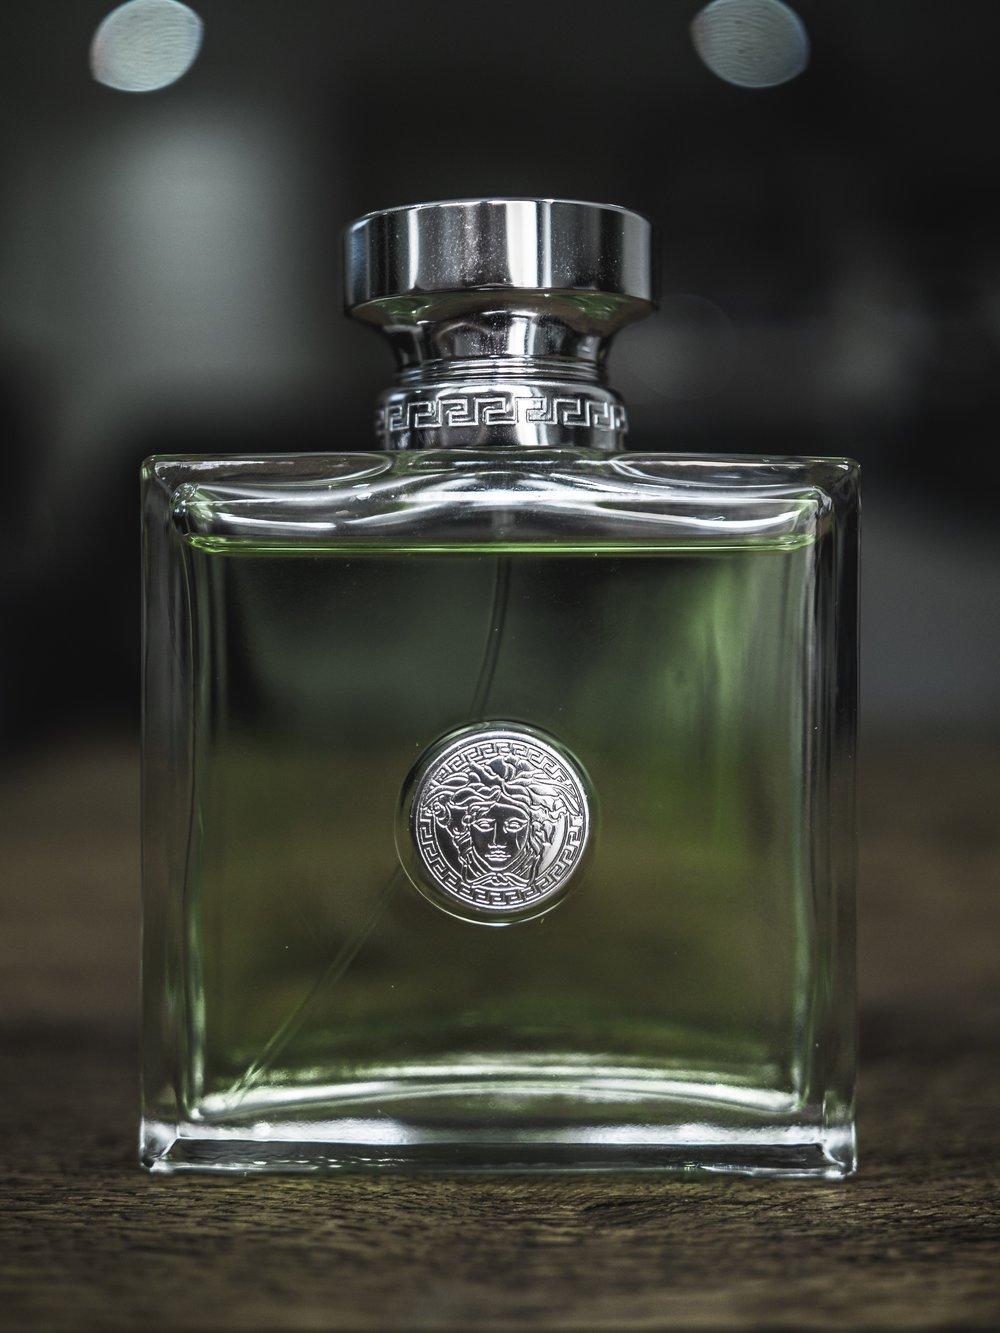 Versace Versense Fragrance Review